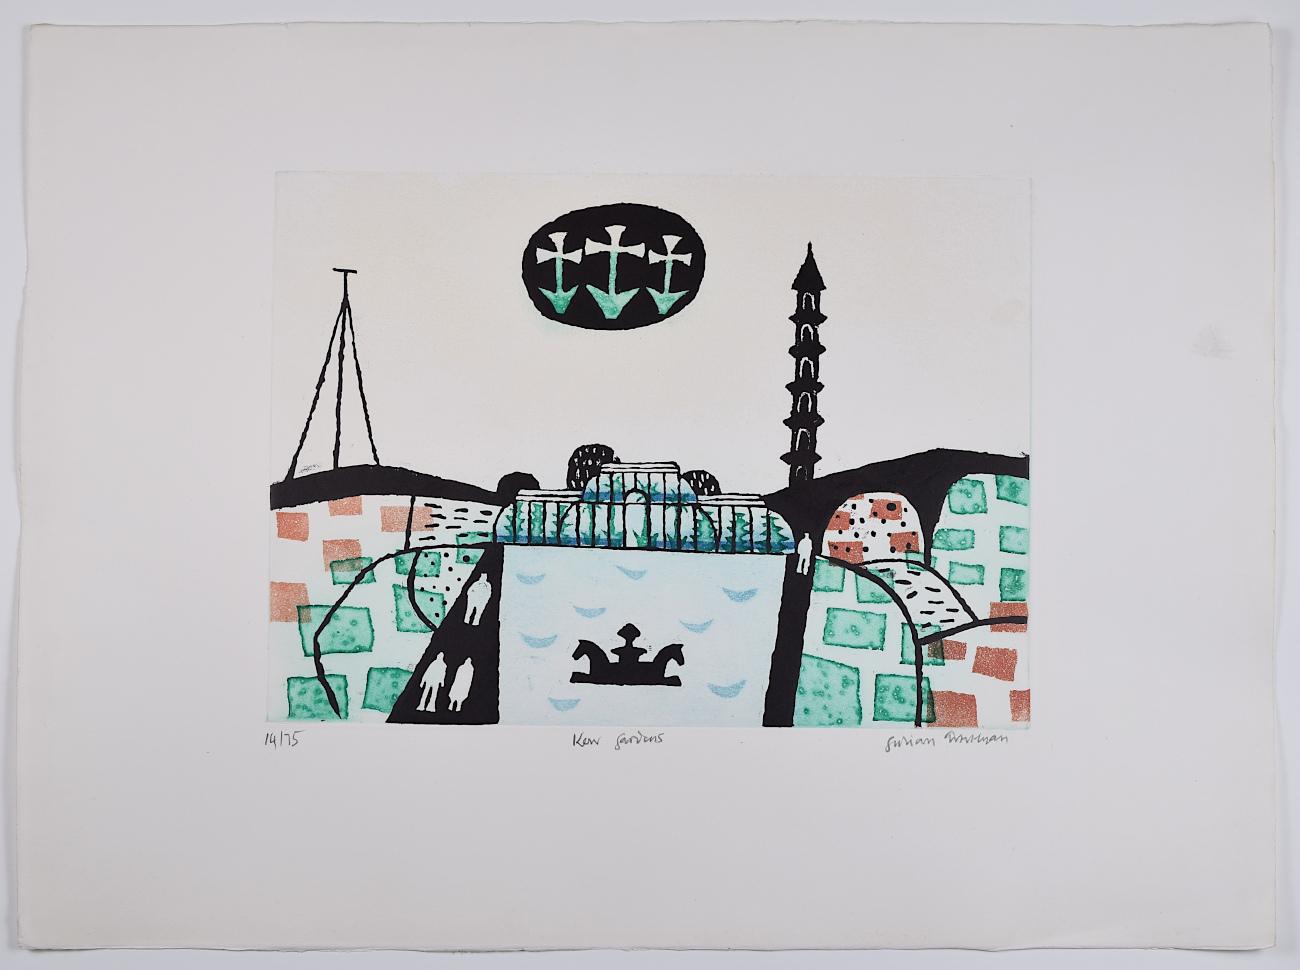 Julian Trevelyan Kew Gardens etching aquatint print for sale